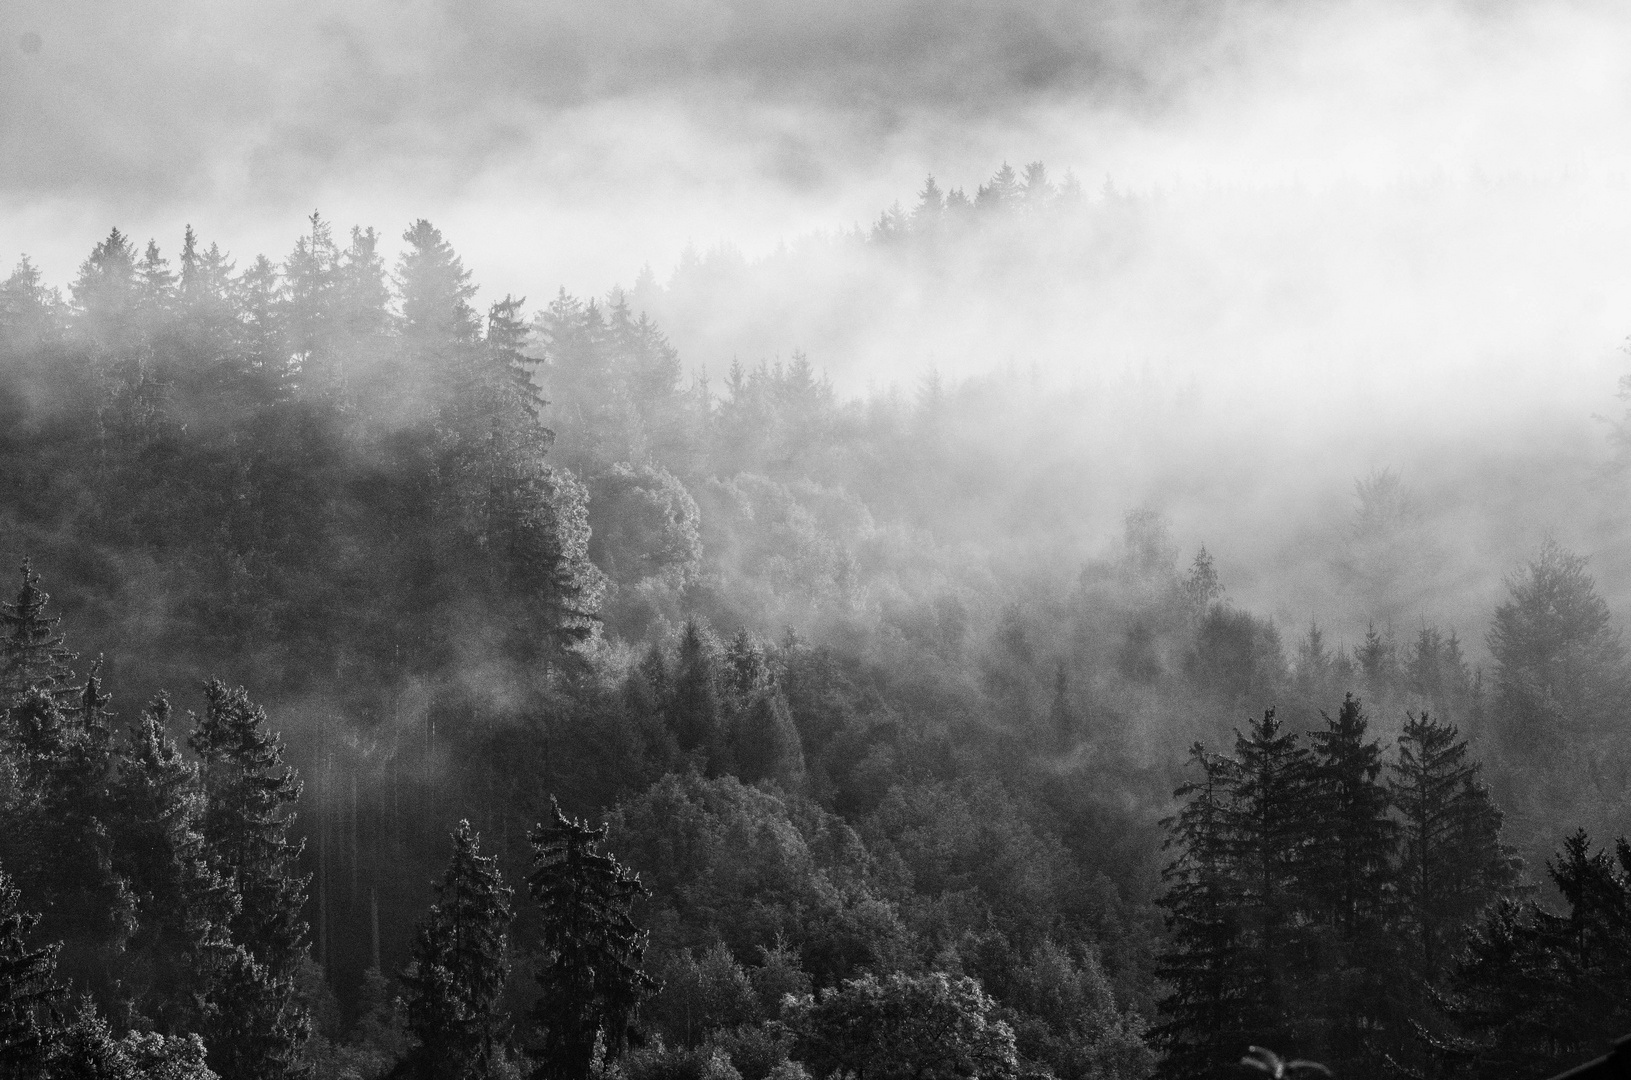 Nebel in Hopfen